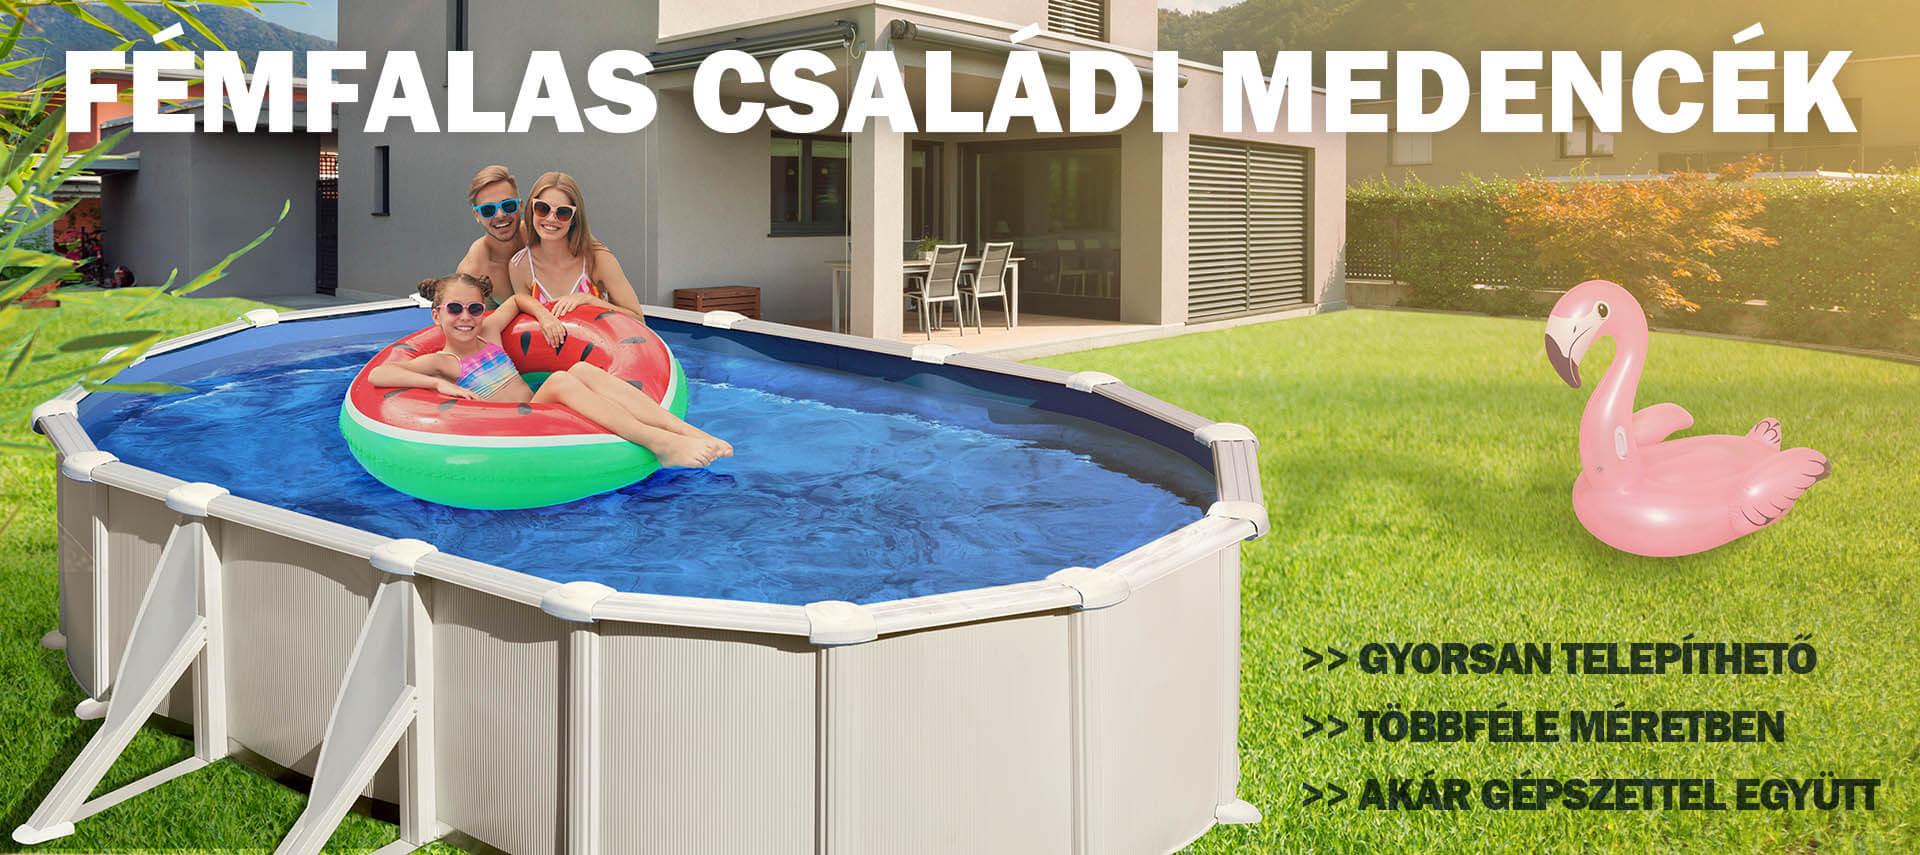 Fémfalas családi medencék - Aqualing.hu